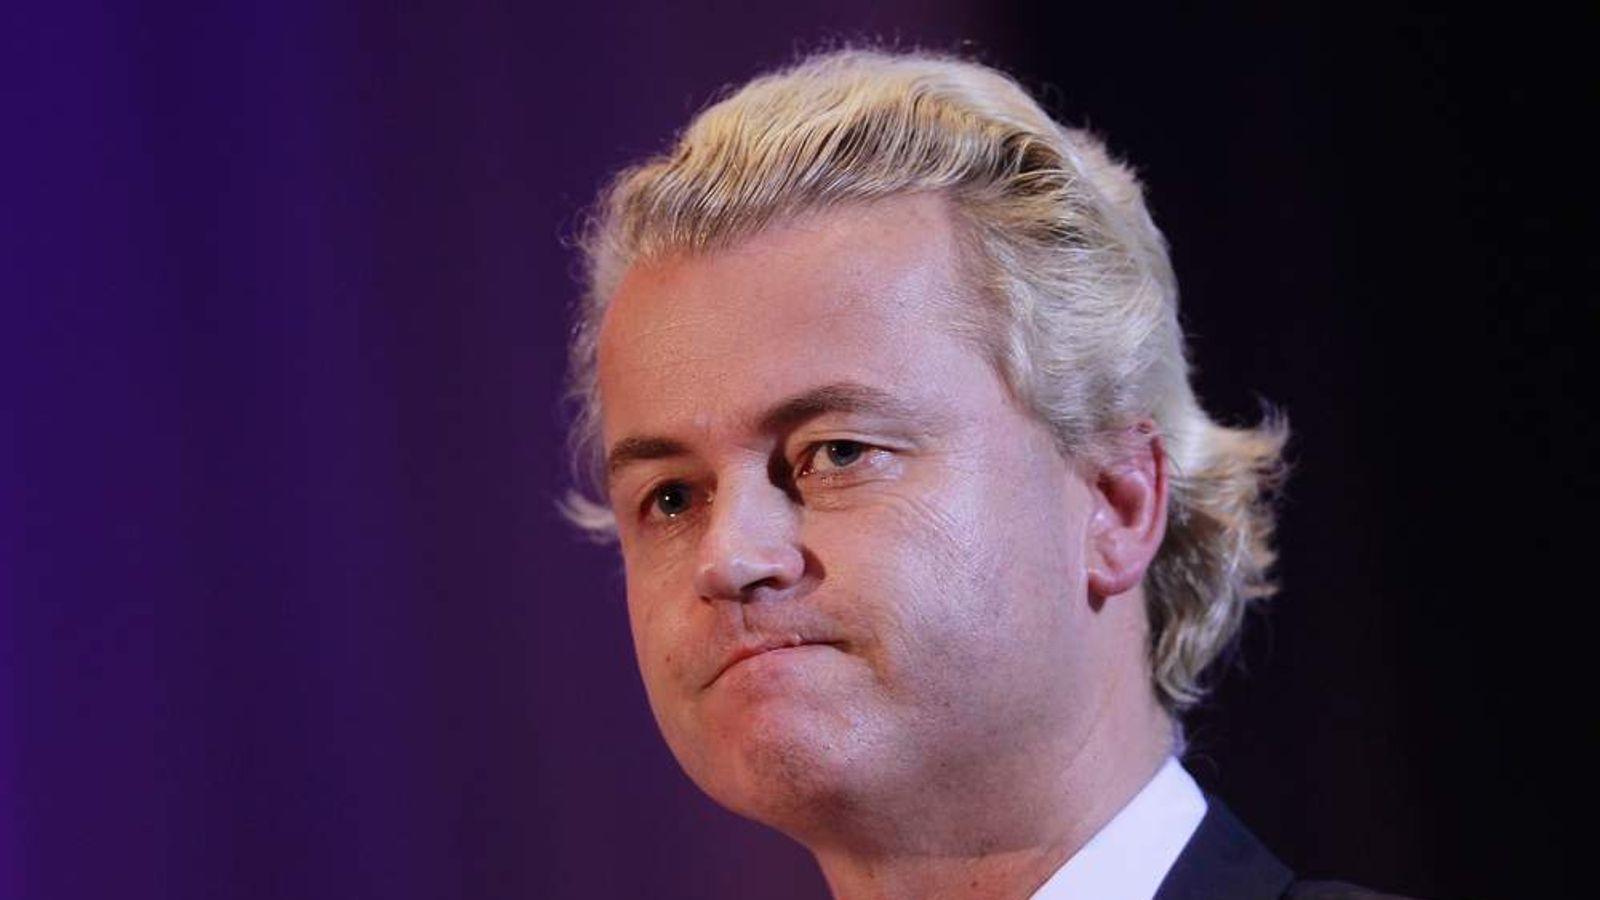 Geert Wilders Speaks In Berlin